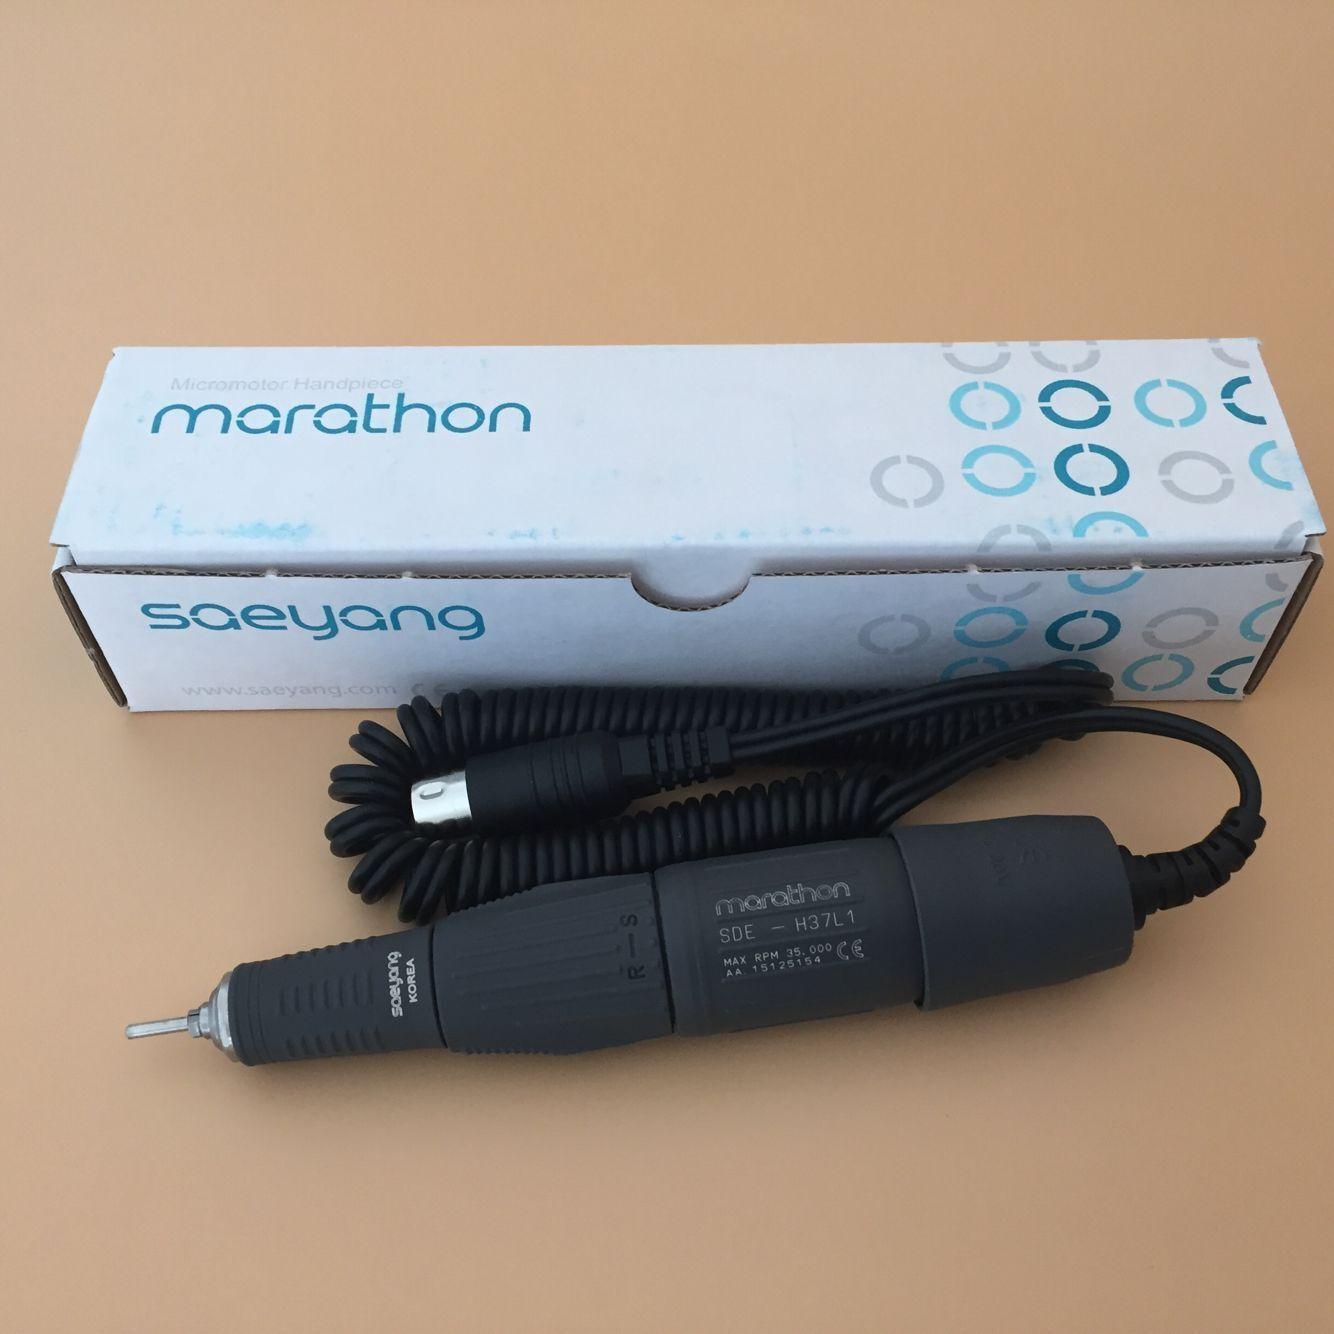 Dental Marathon Lab Electric Micromotor Motor Handpiece for Polishing 35K RPM